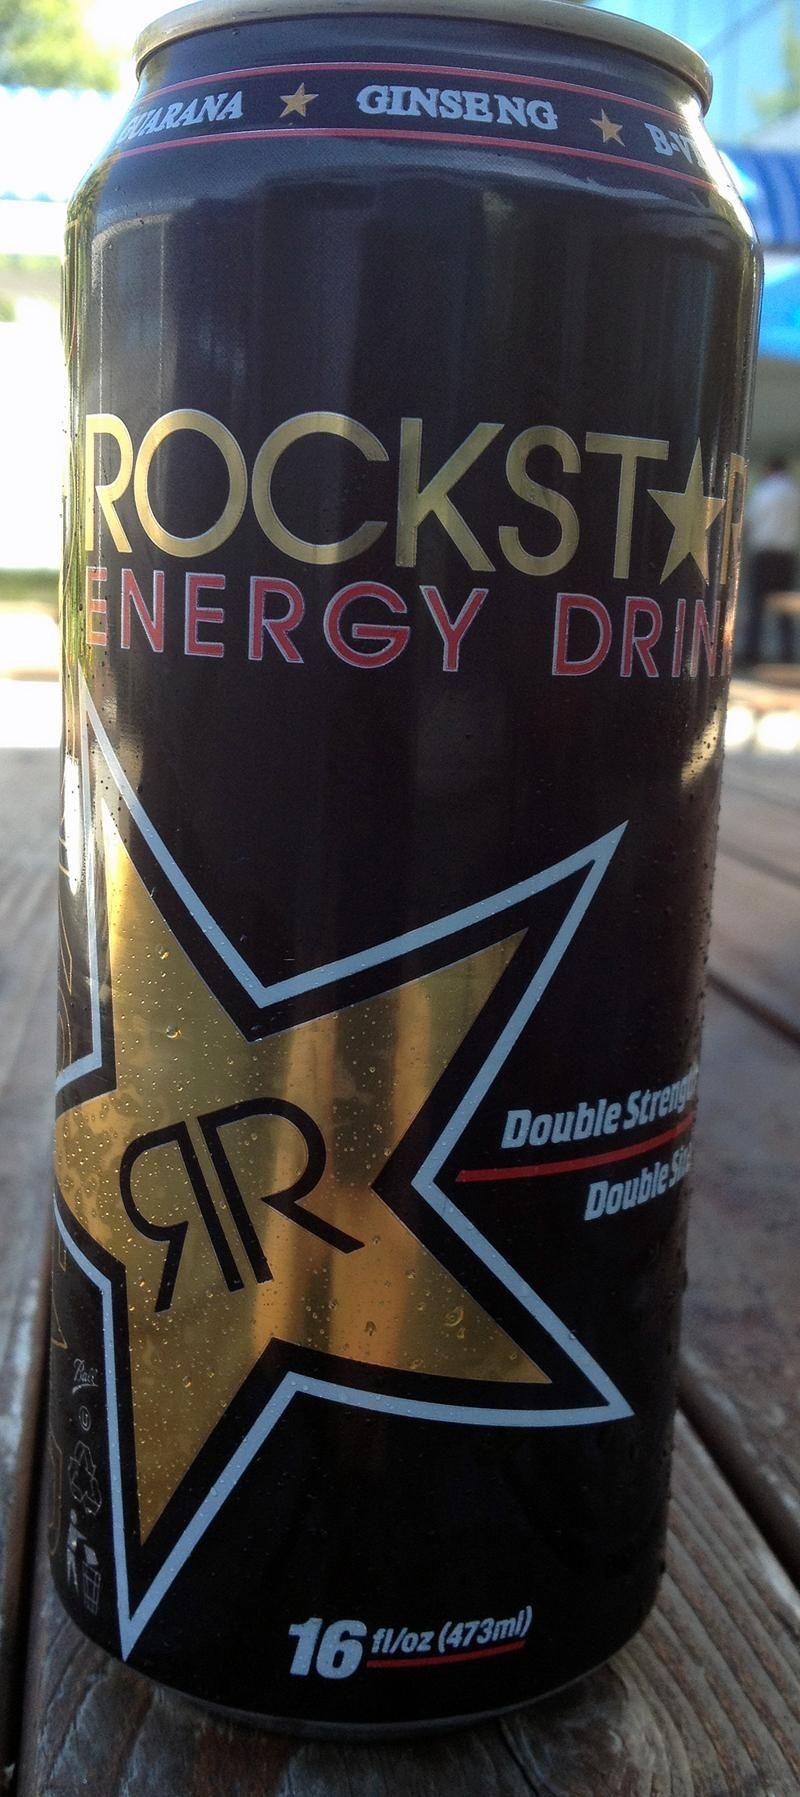 ROCKSTAR ENERGY DRINK Claim: